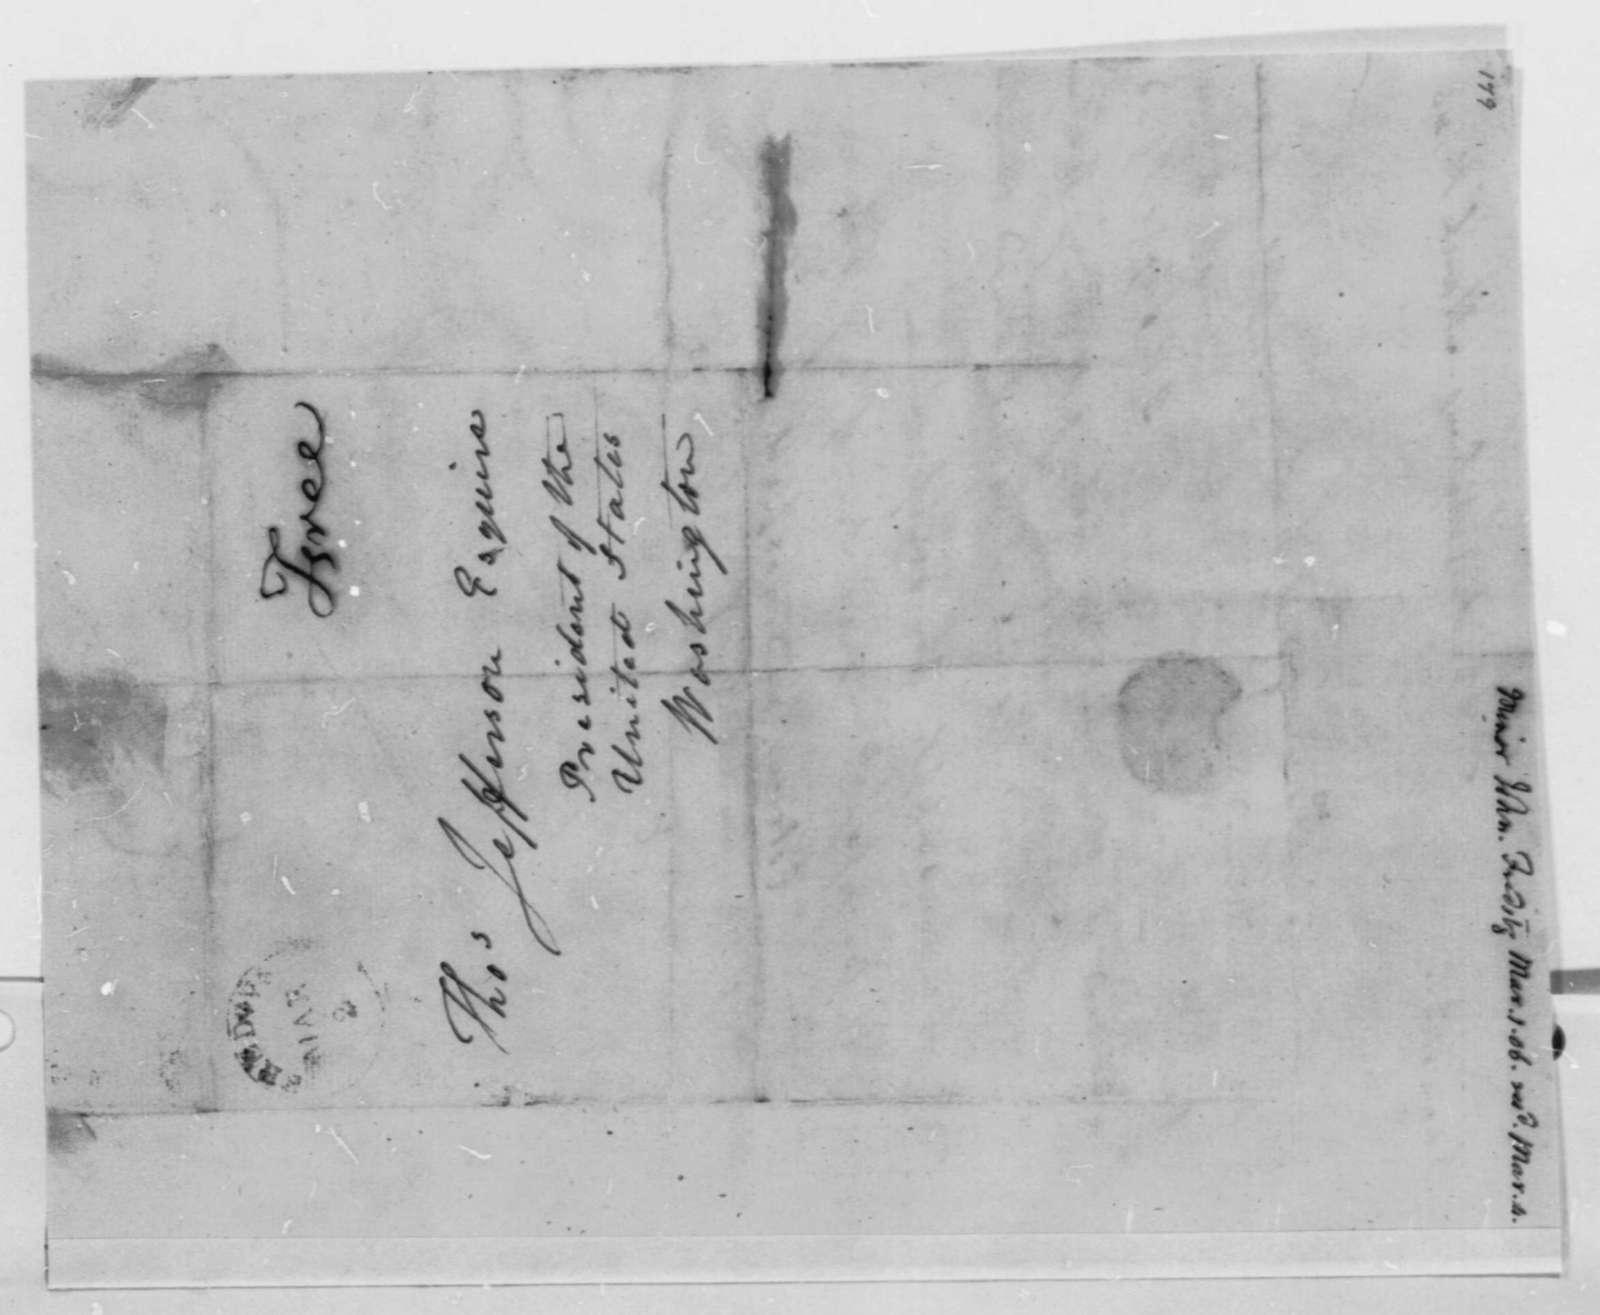 John Minor to Thomas Jefferson, March 1, 1806